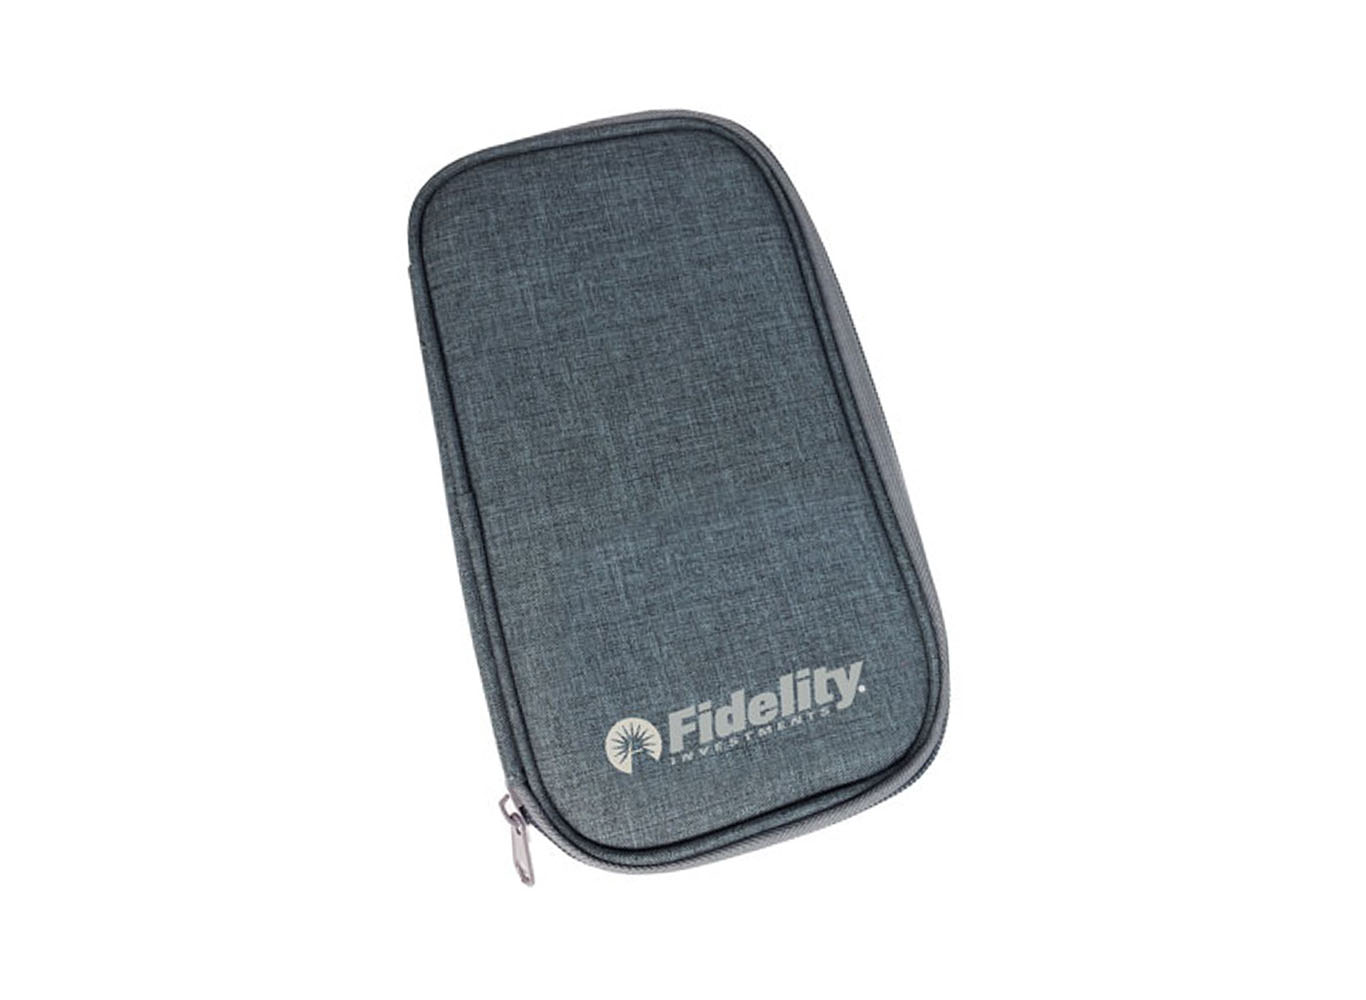 RPET RFID Safety Wallet